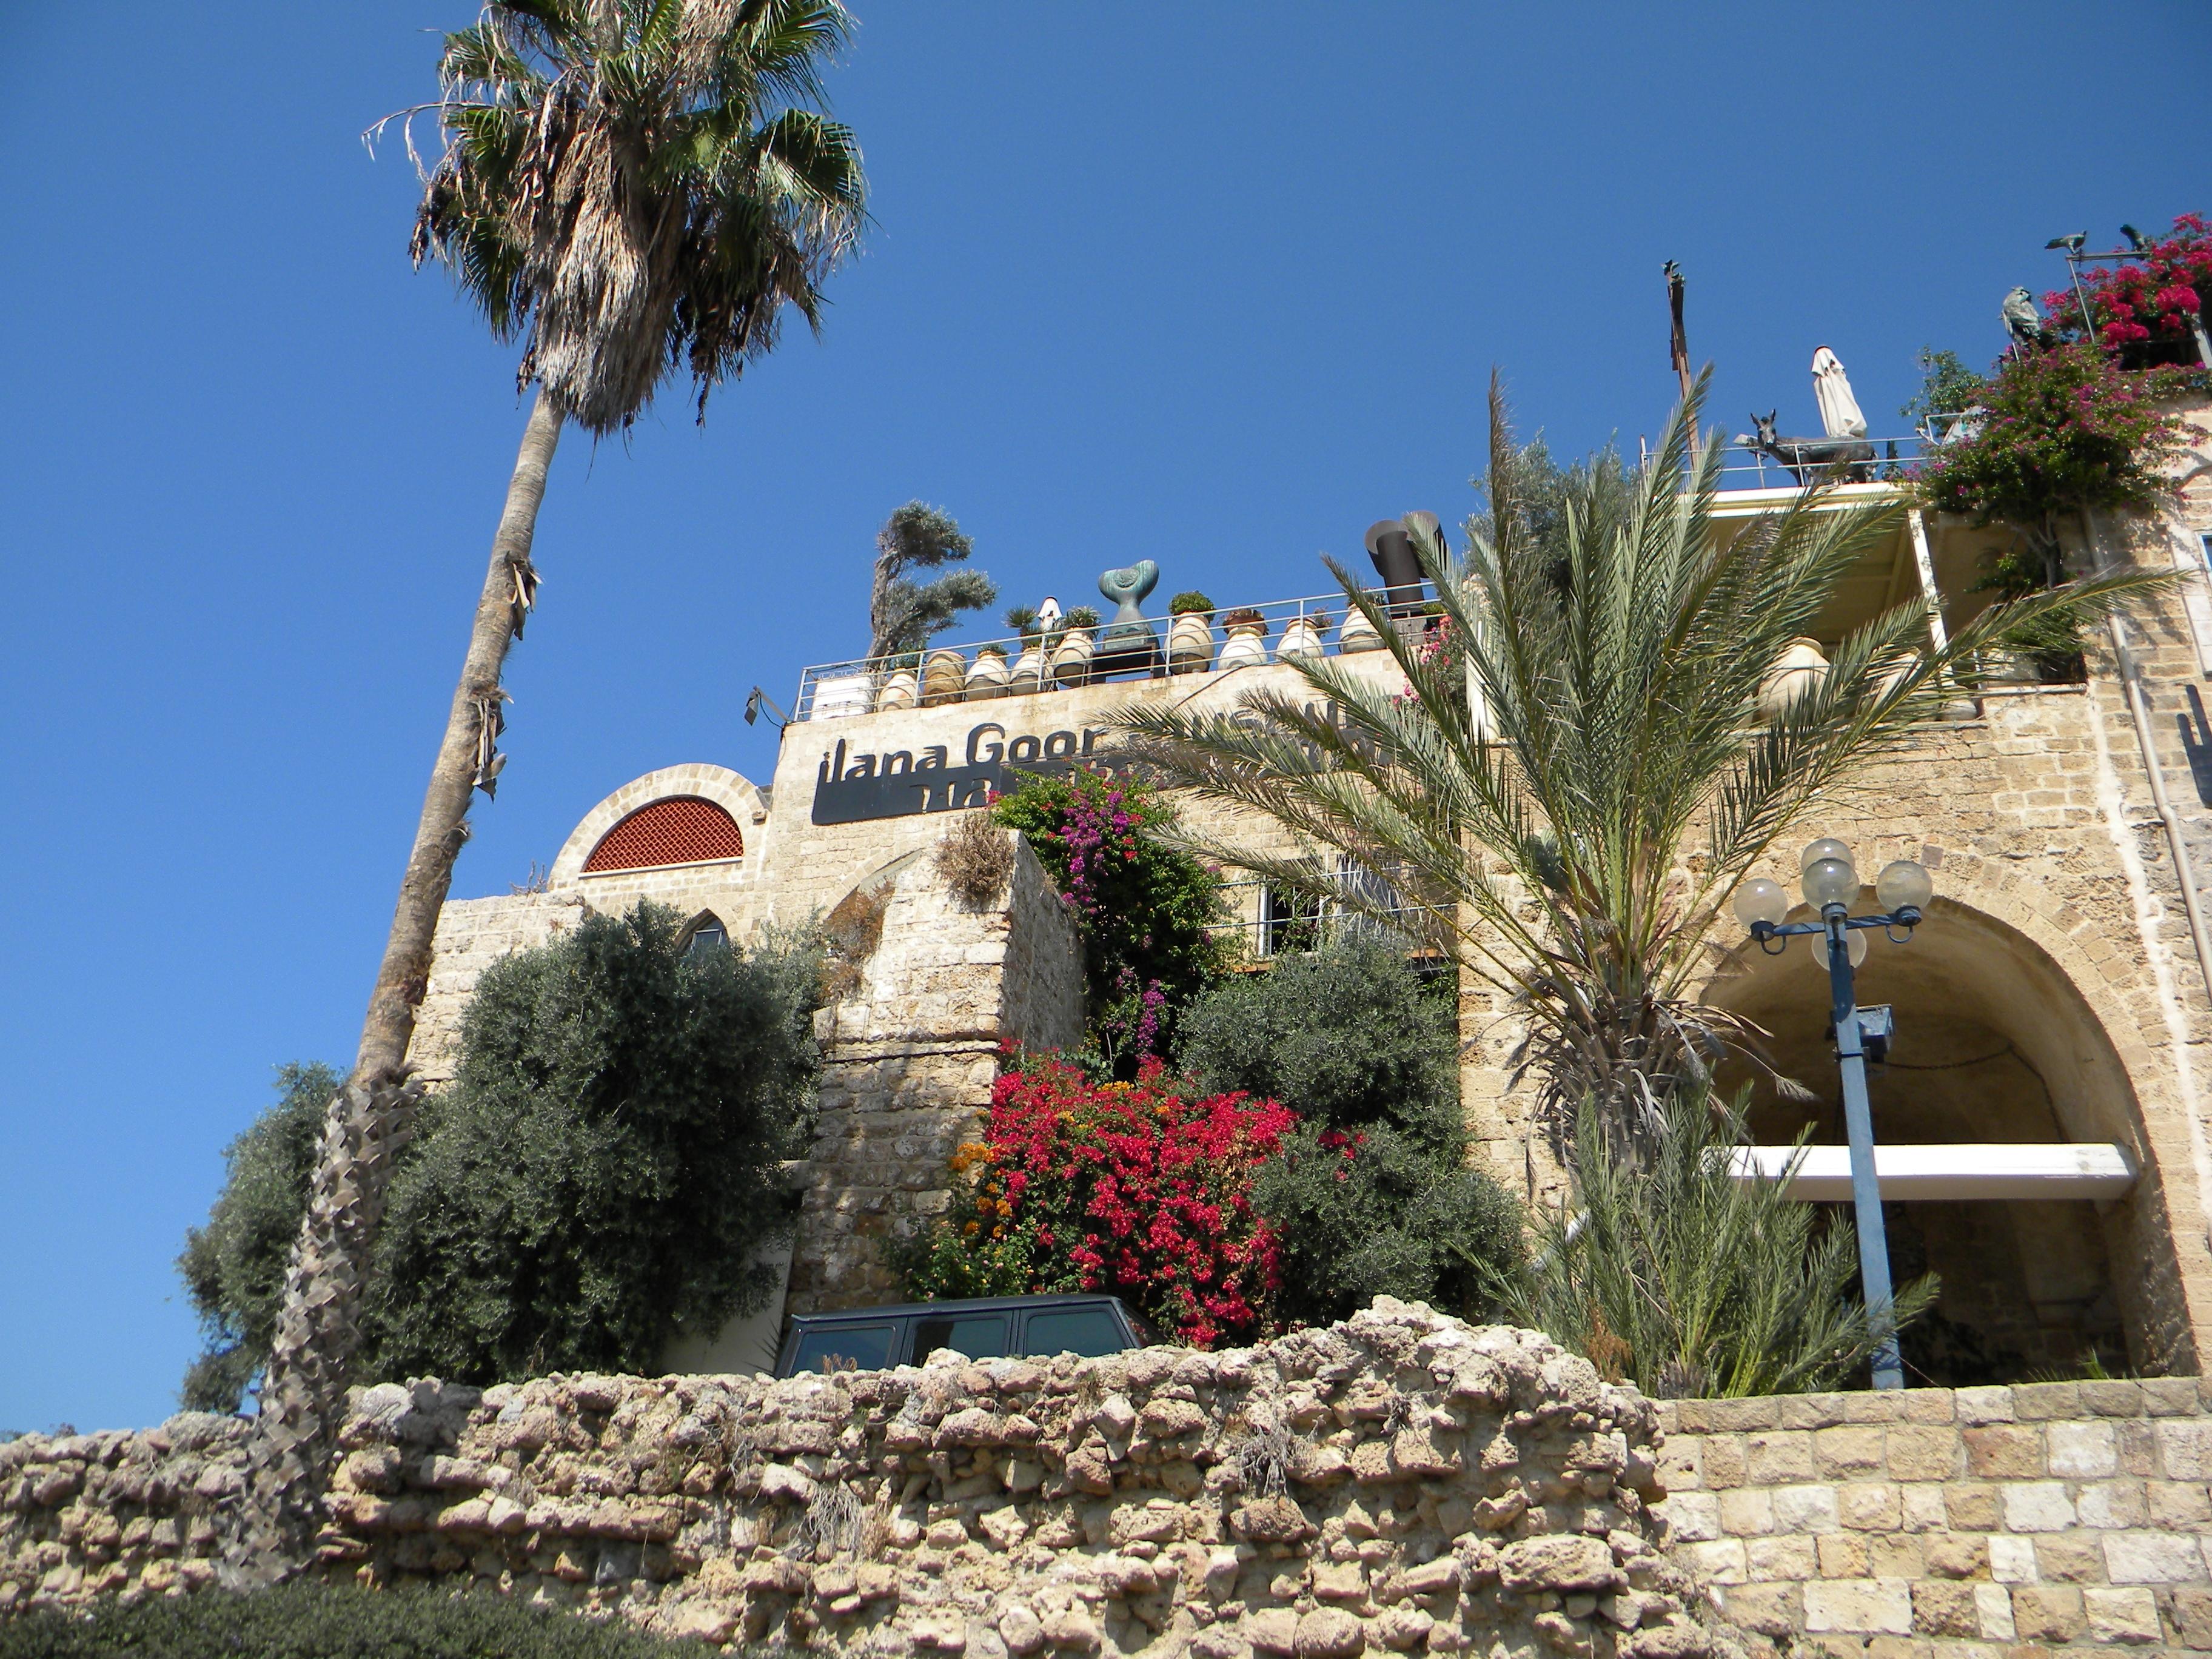 File:ISRAEL, Tel Aviv-Jaffa, Ilana Goor Museum (ID is 3